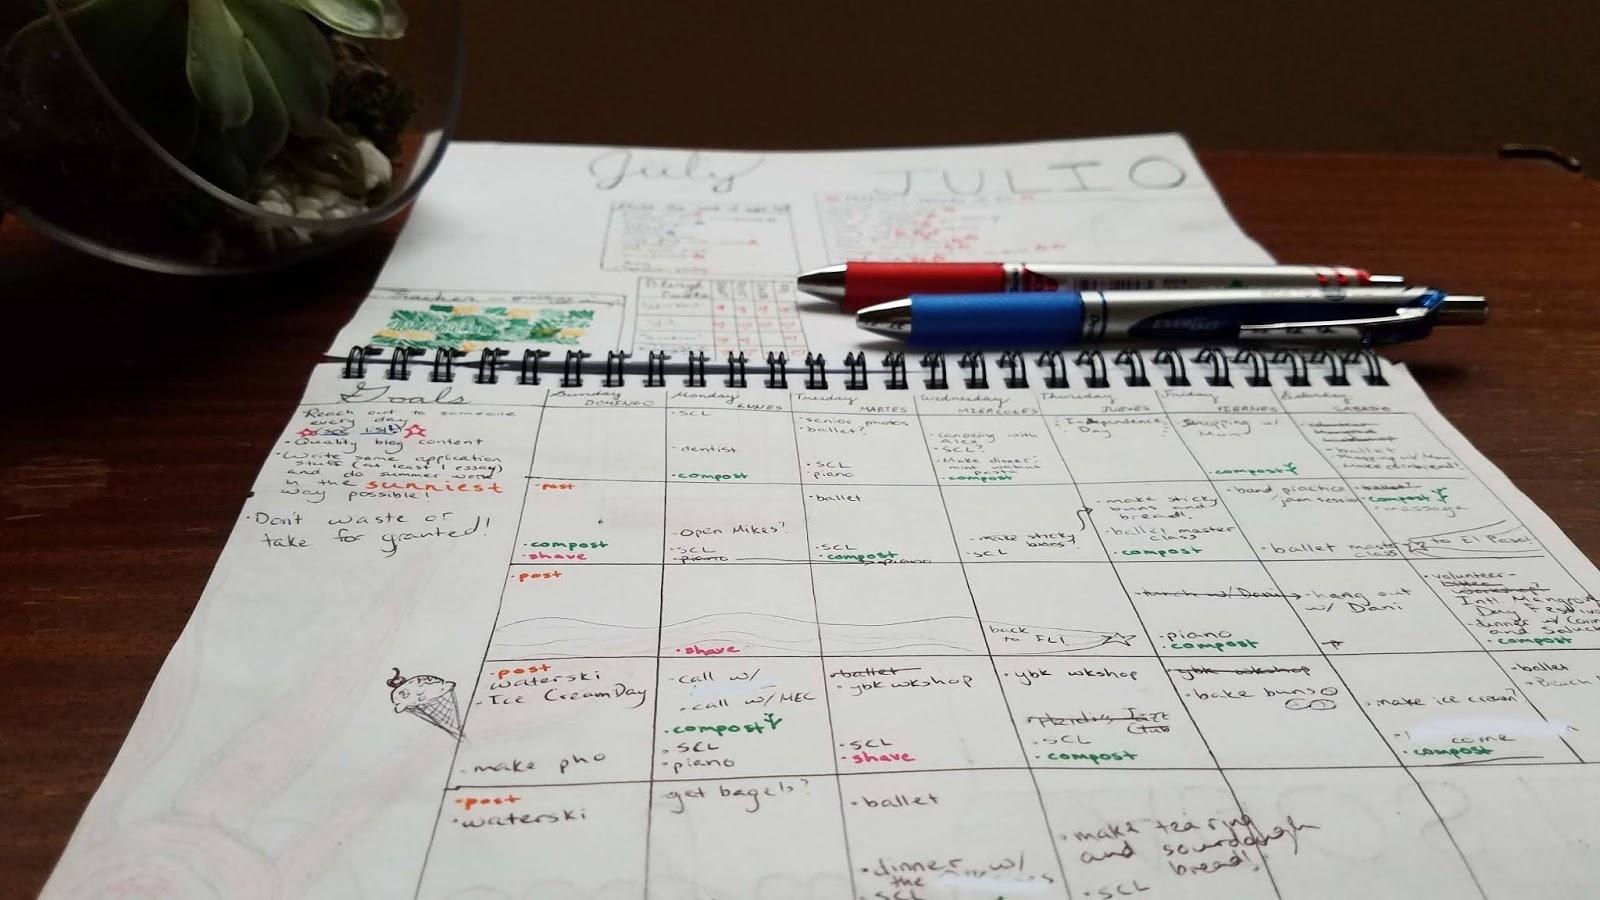 How To Make A Bullet Journal-Calendar Hybrid - The Blergh